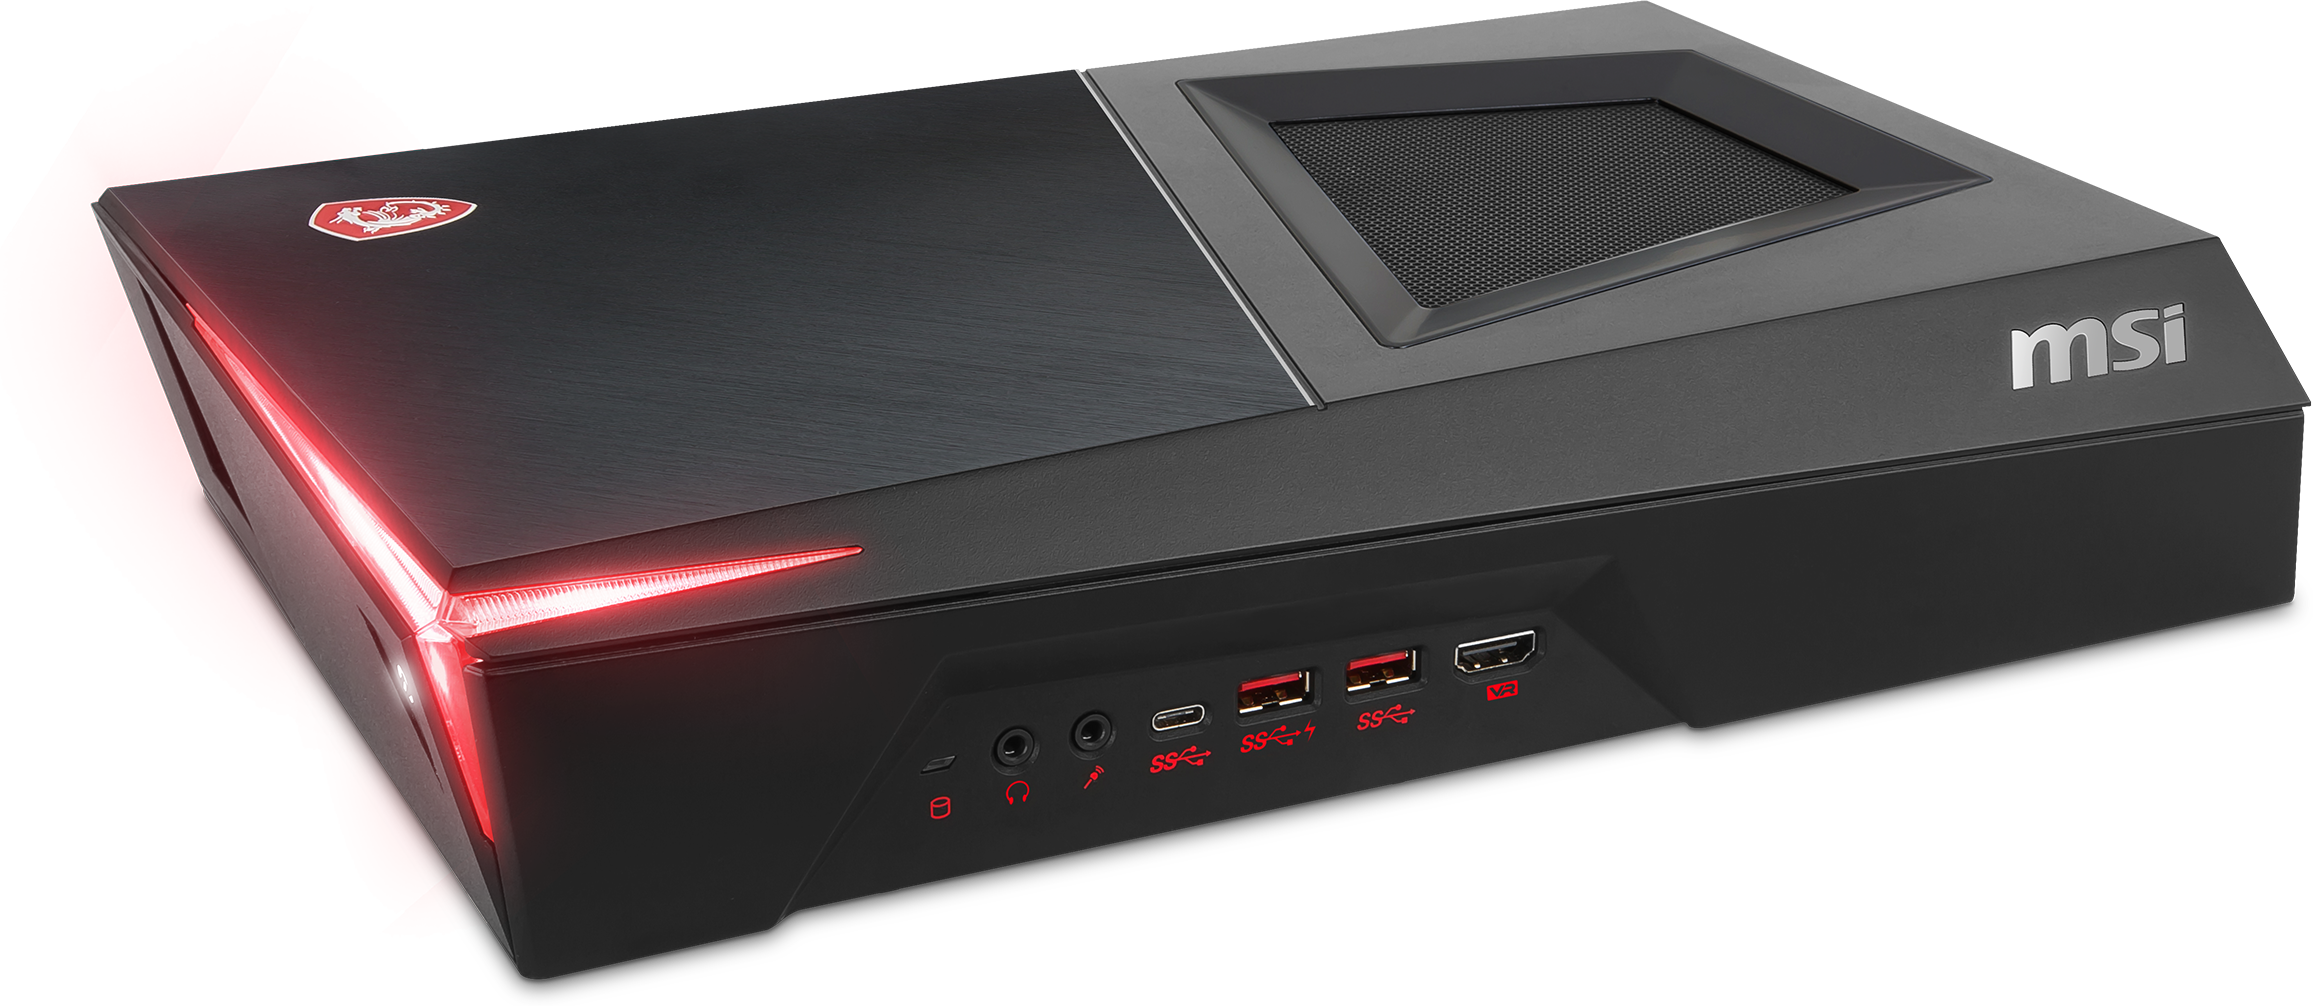 MSI Trident 3 9SC-448US Gaming Desktop